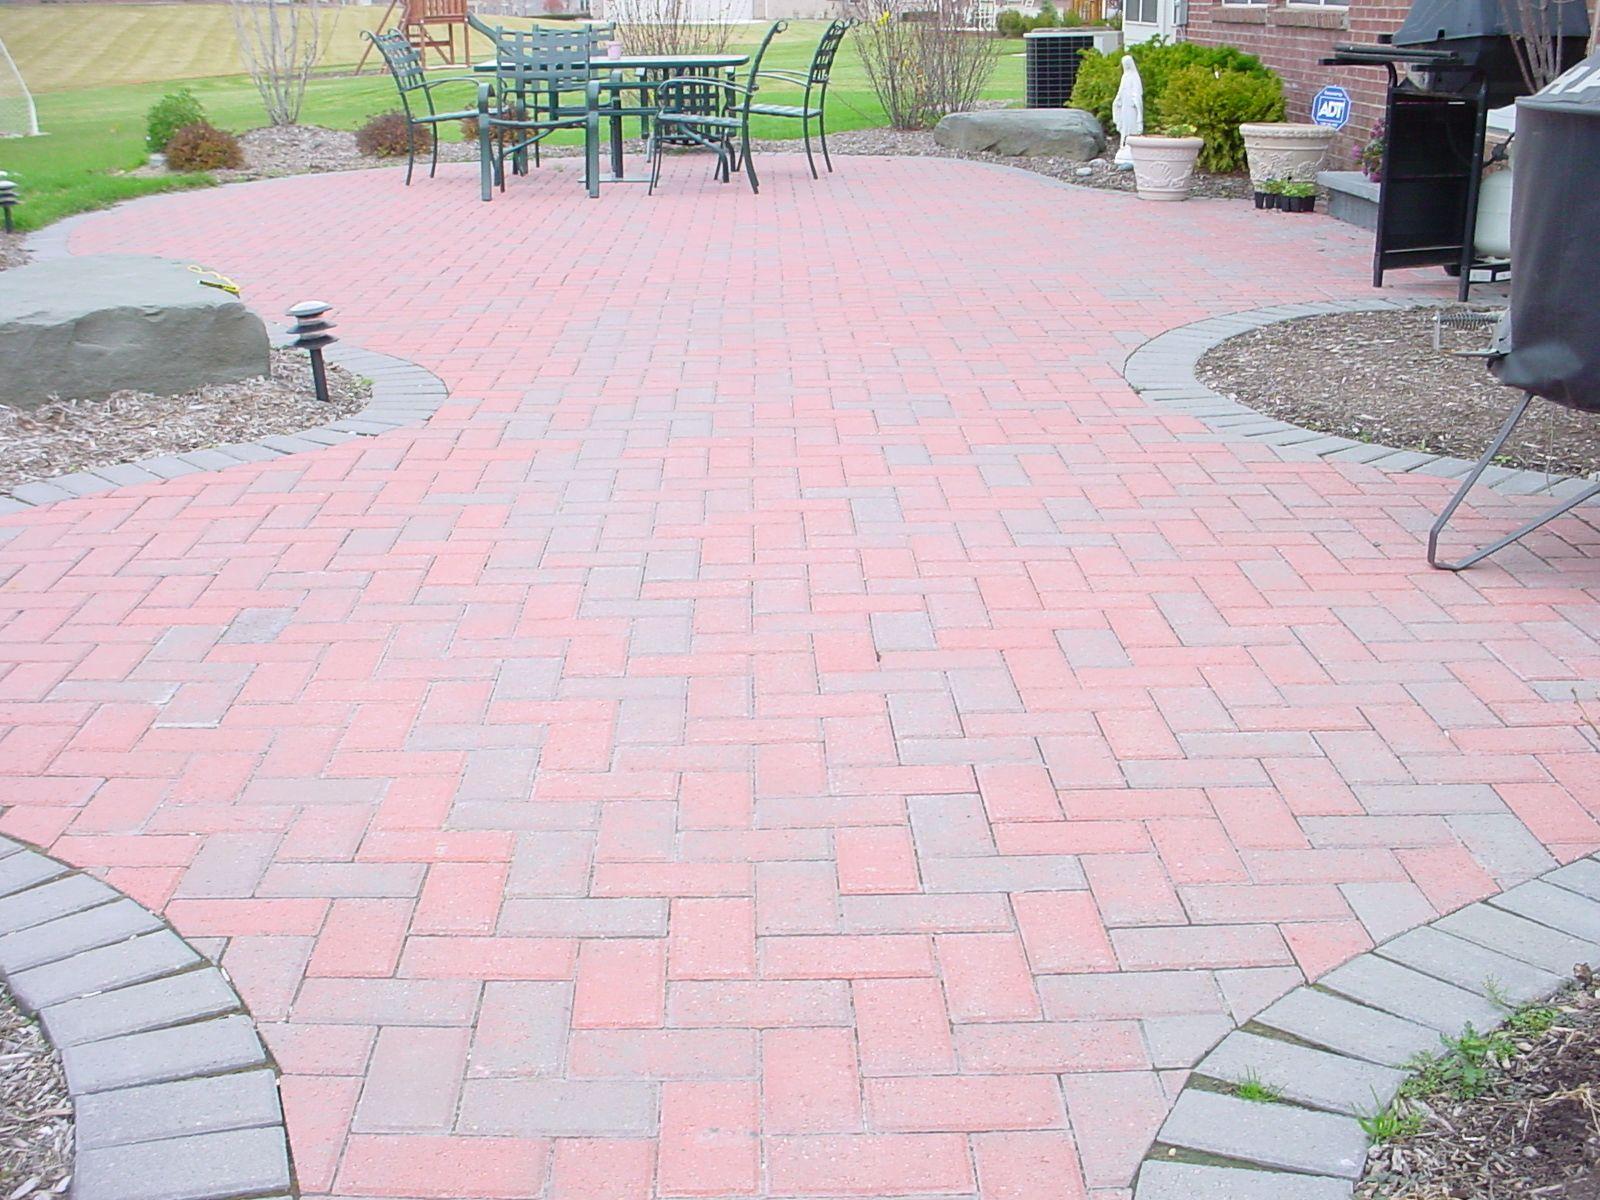 Red Hollandstone brick paver patio. in 2019 | Patio, Brick ... on Red Paver Patio Ideas id=90412